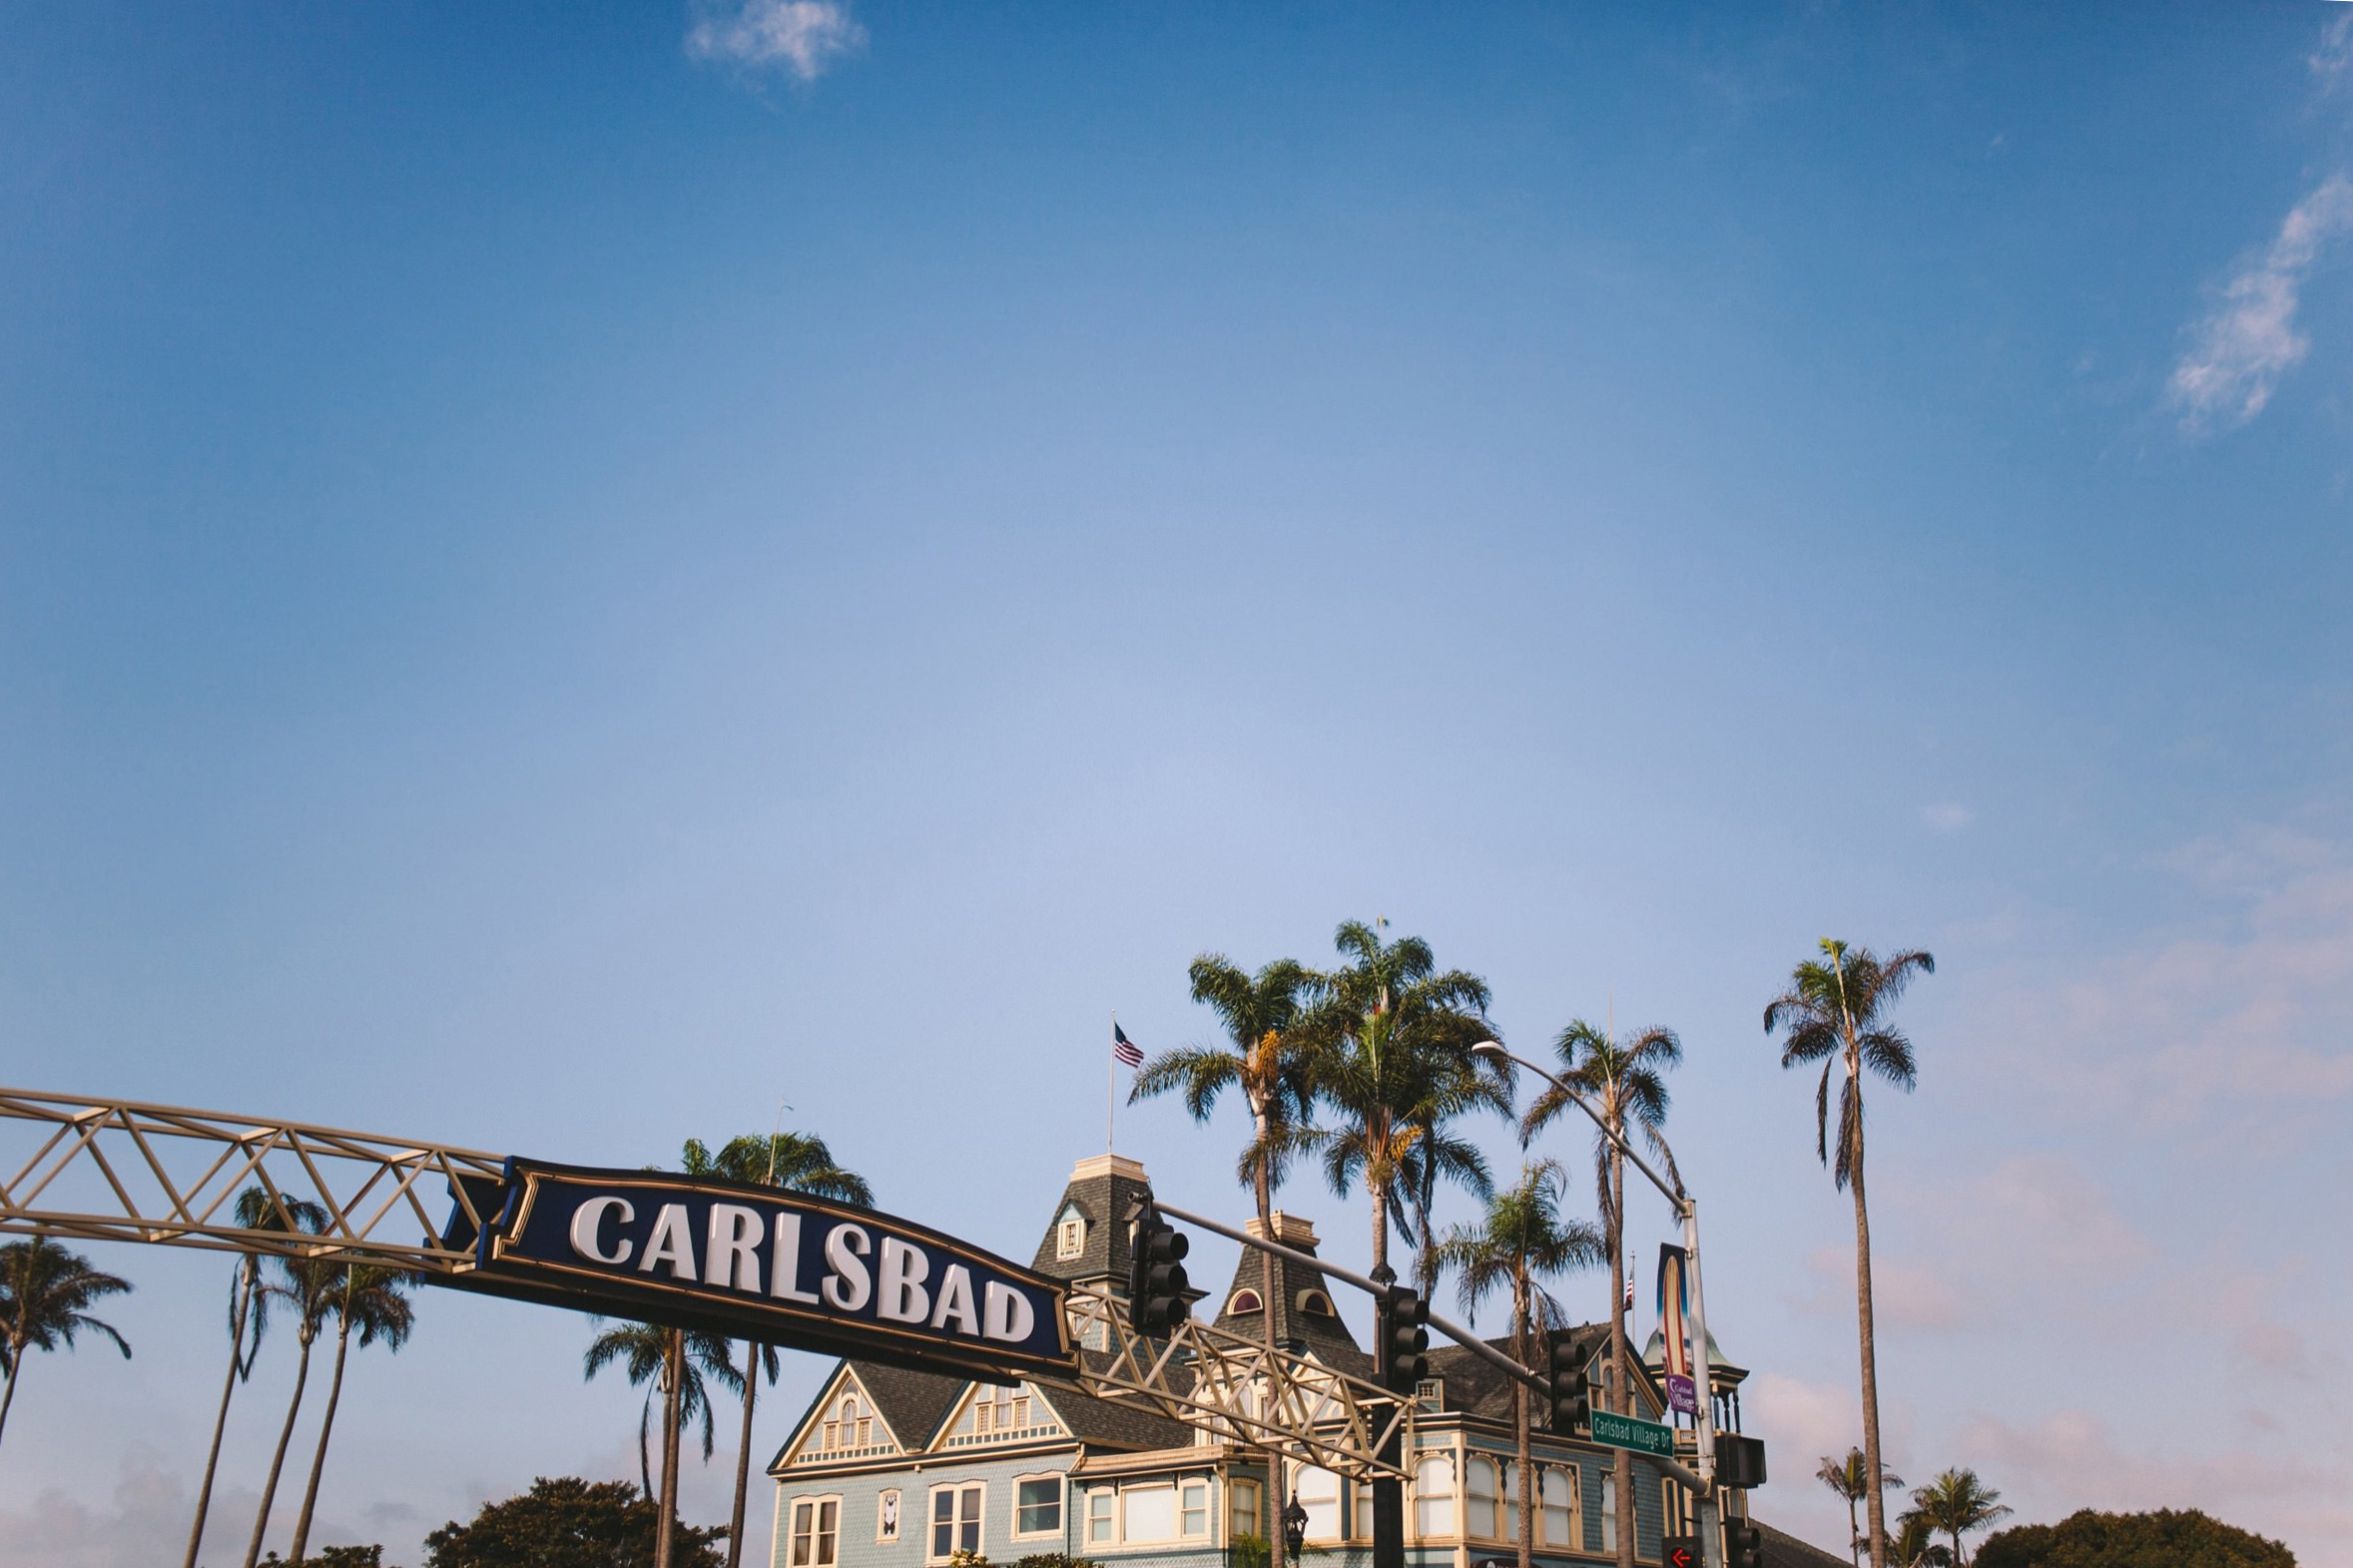 Carlsbad Sign Wedding Day Shot